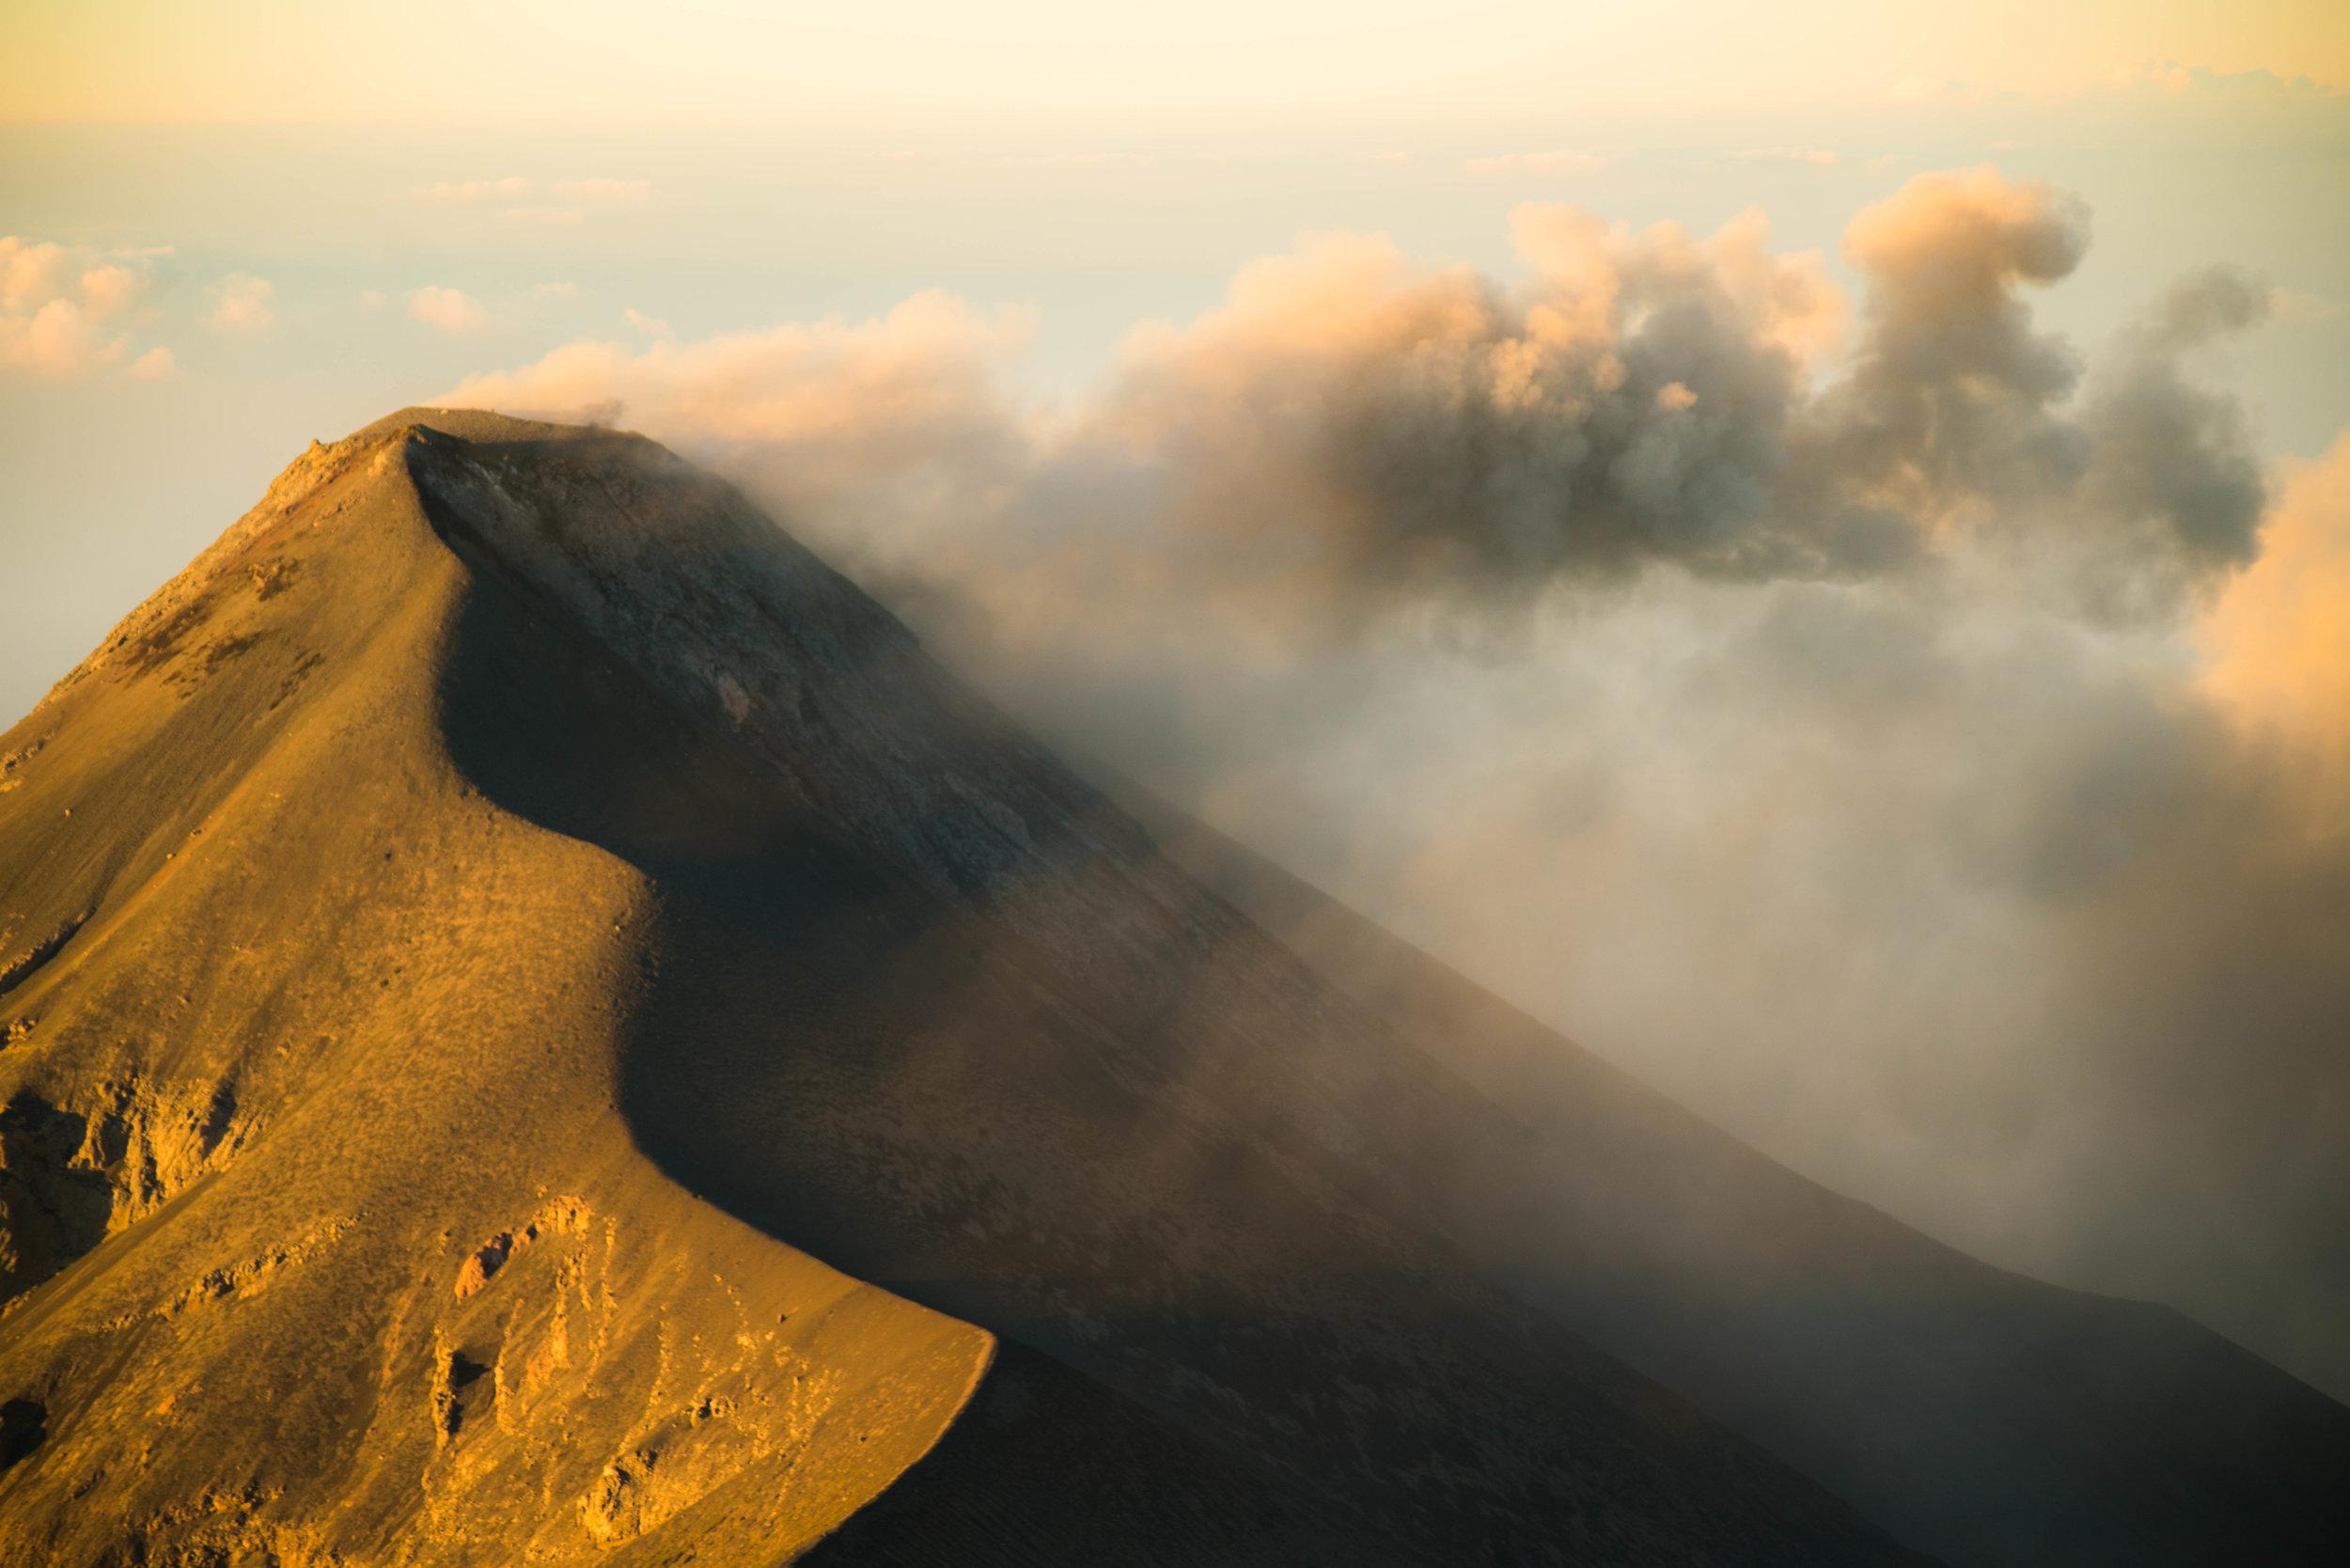 Volcan de Fuego erupting from Acatenango